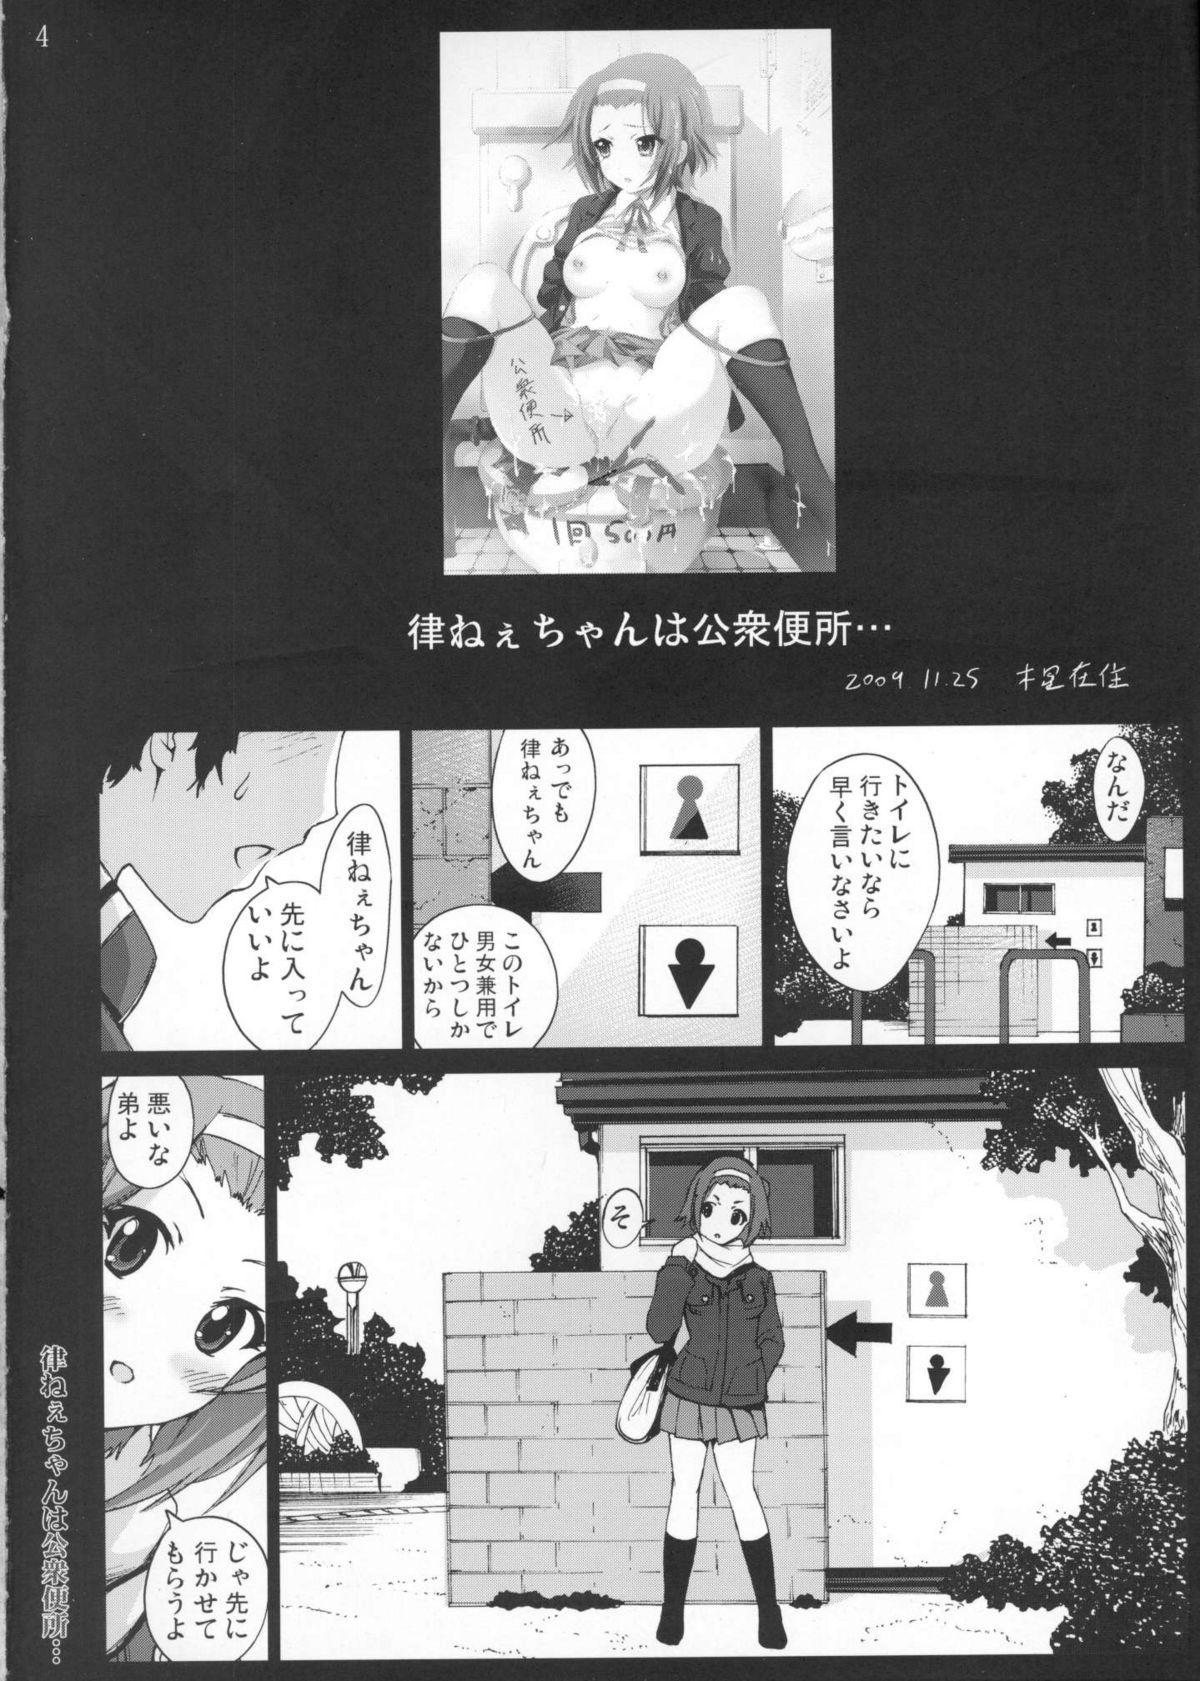 Ritsu-neechan wa Koushuu Benjo... 2